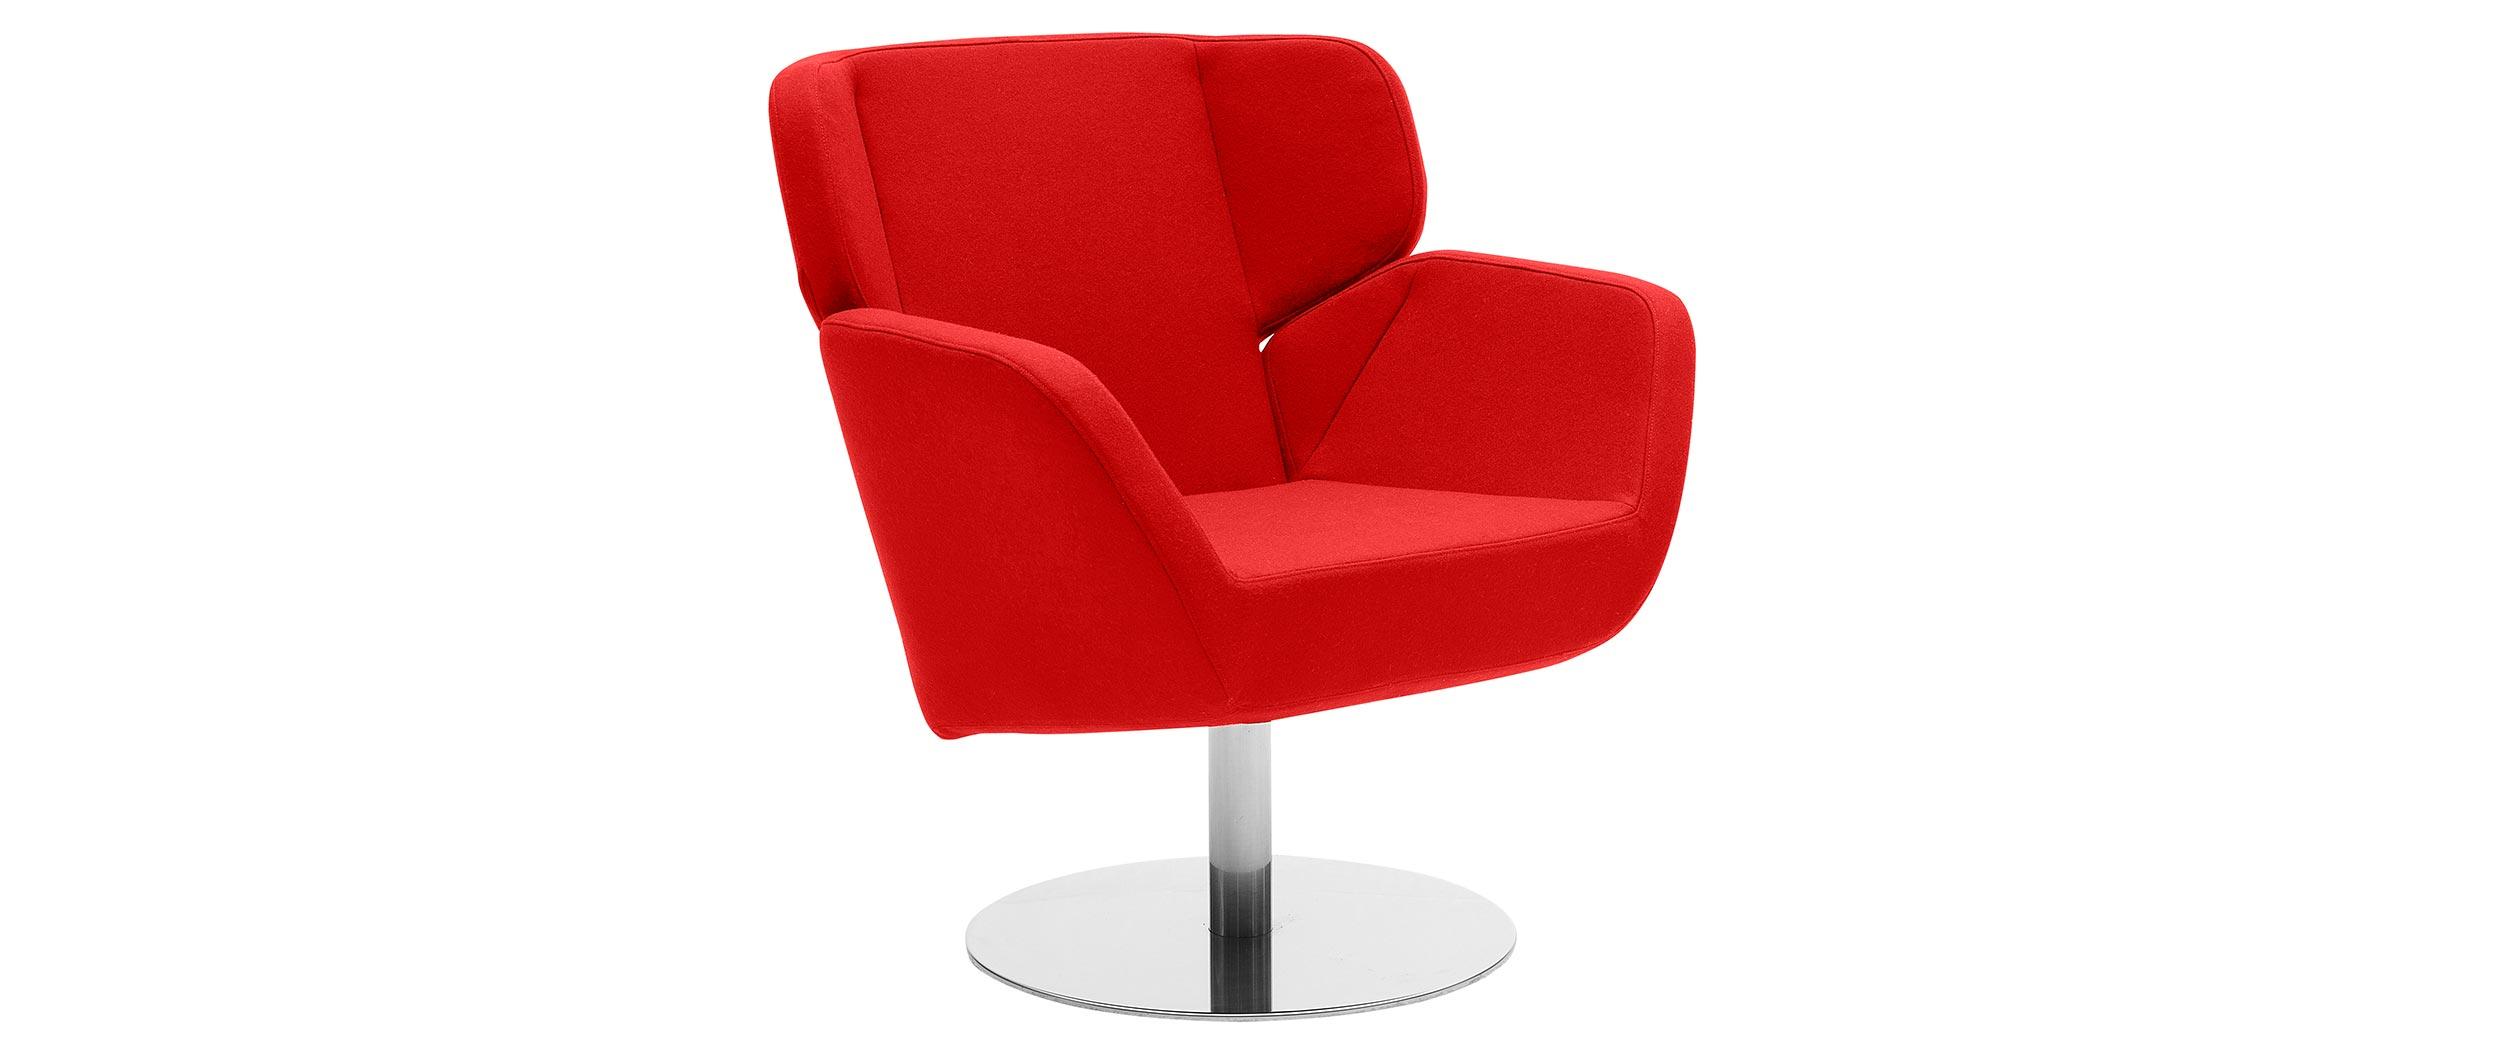 SOFTLINE Cosy Lounge-Sessel / Ohrensessel mit Drehfuß | mysofabed.de